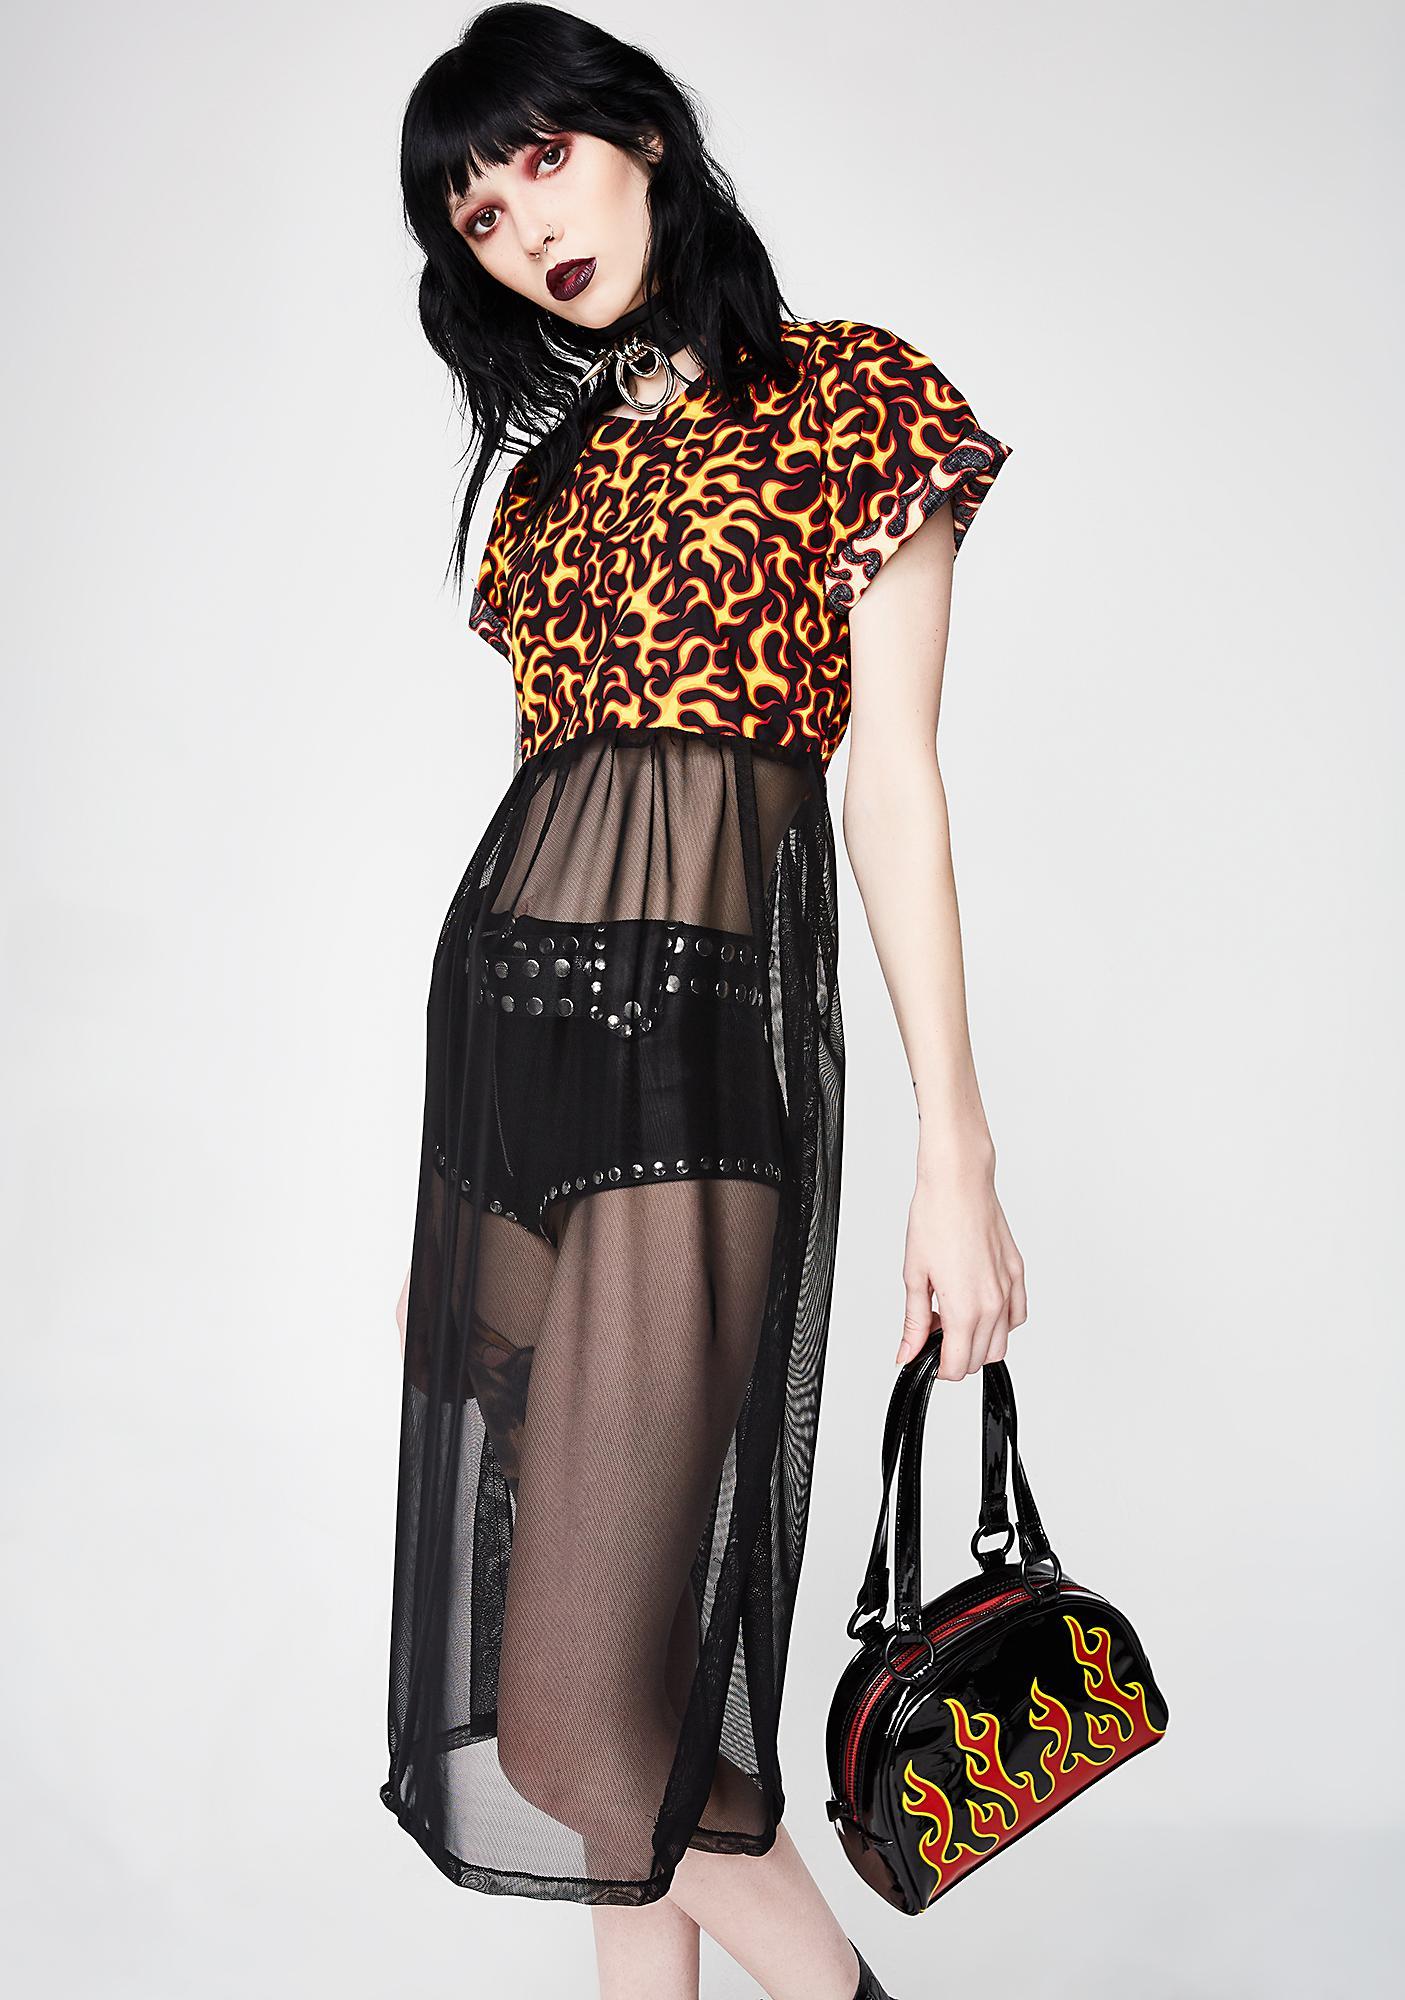 Firebreather Sheer Dress